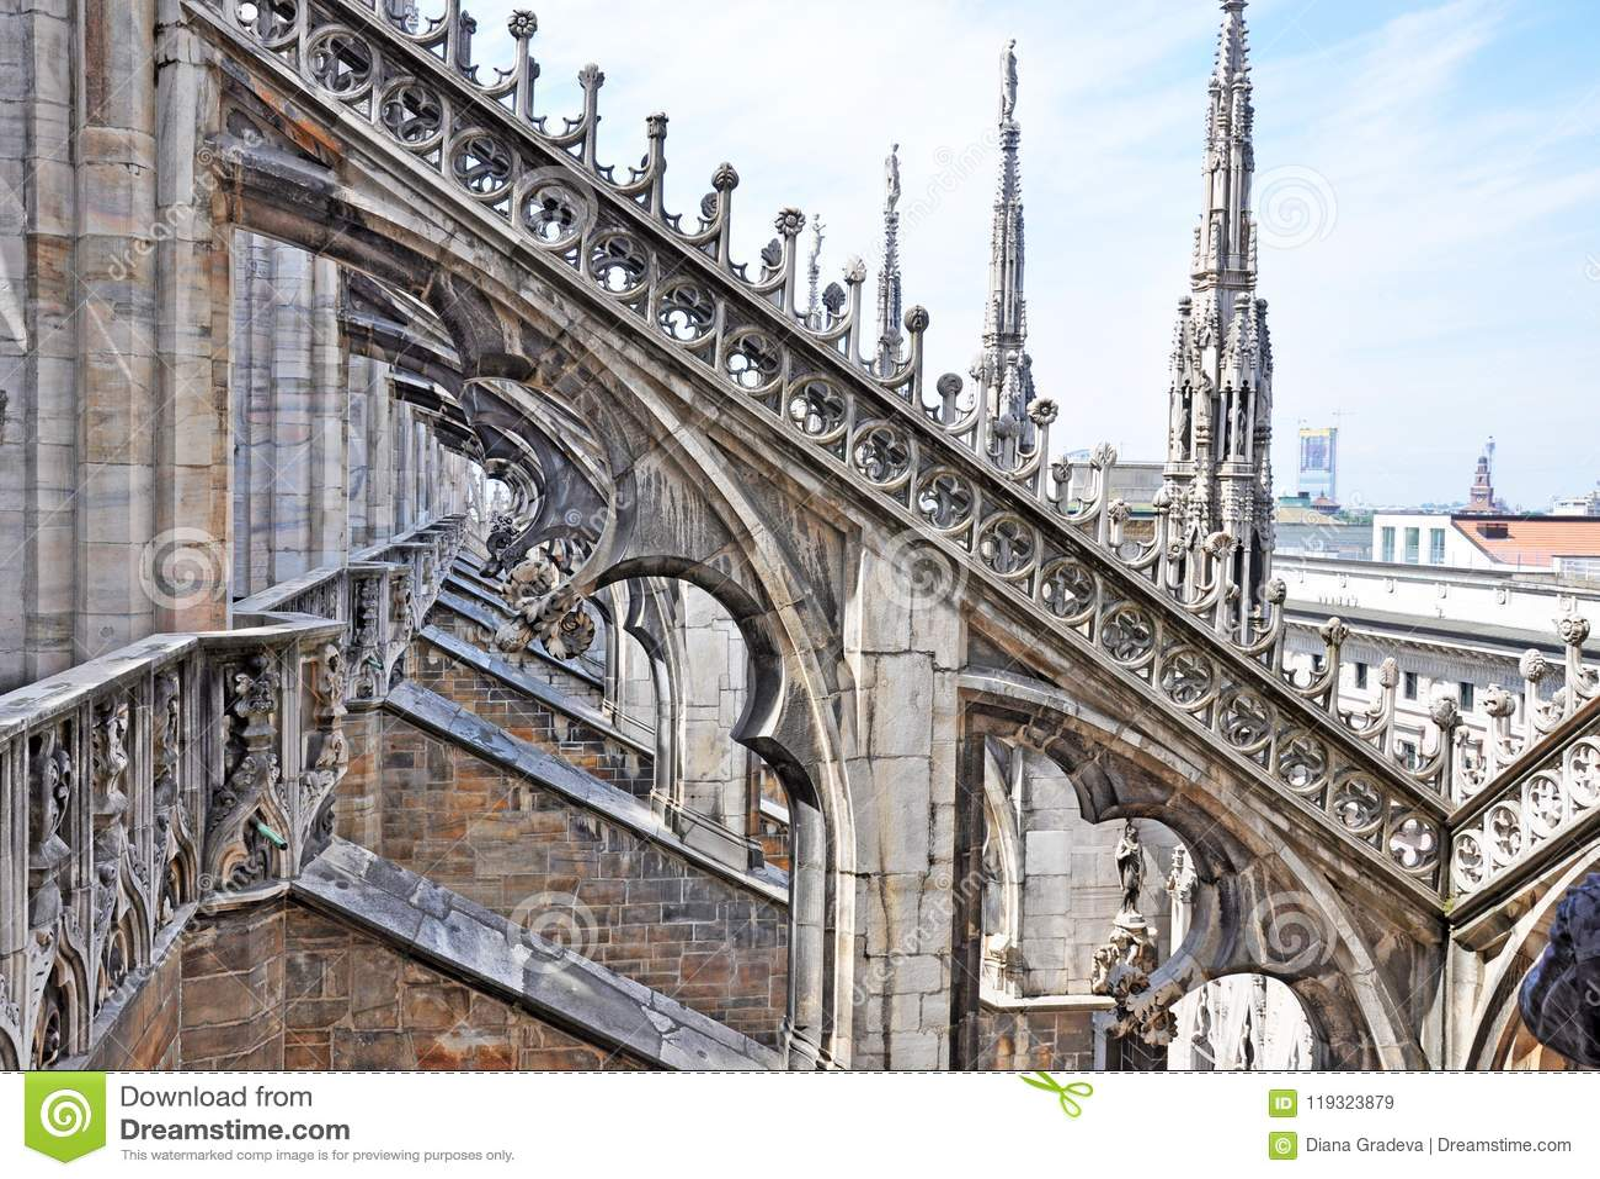 Duomo Di MIlano - The Roof